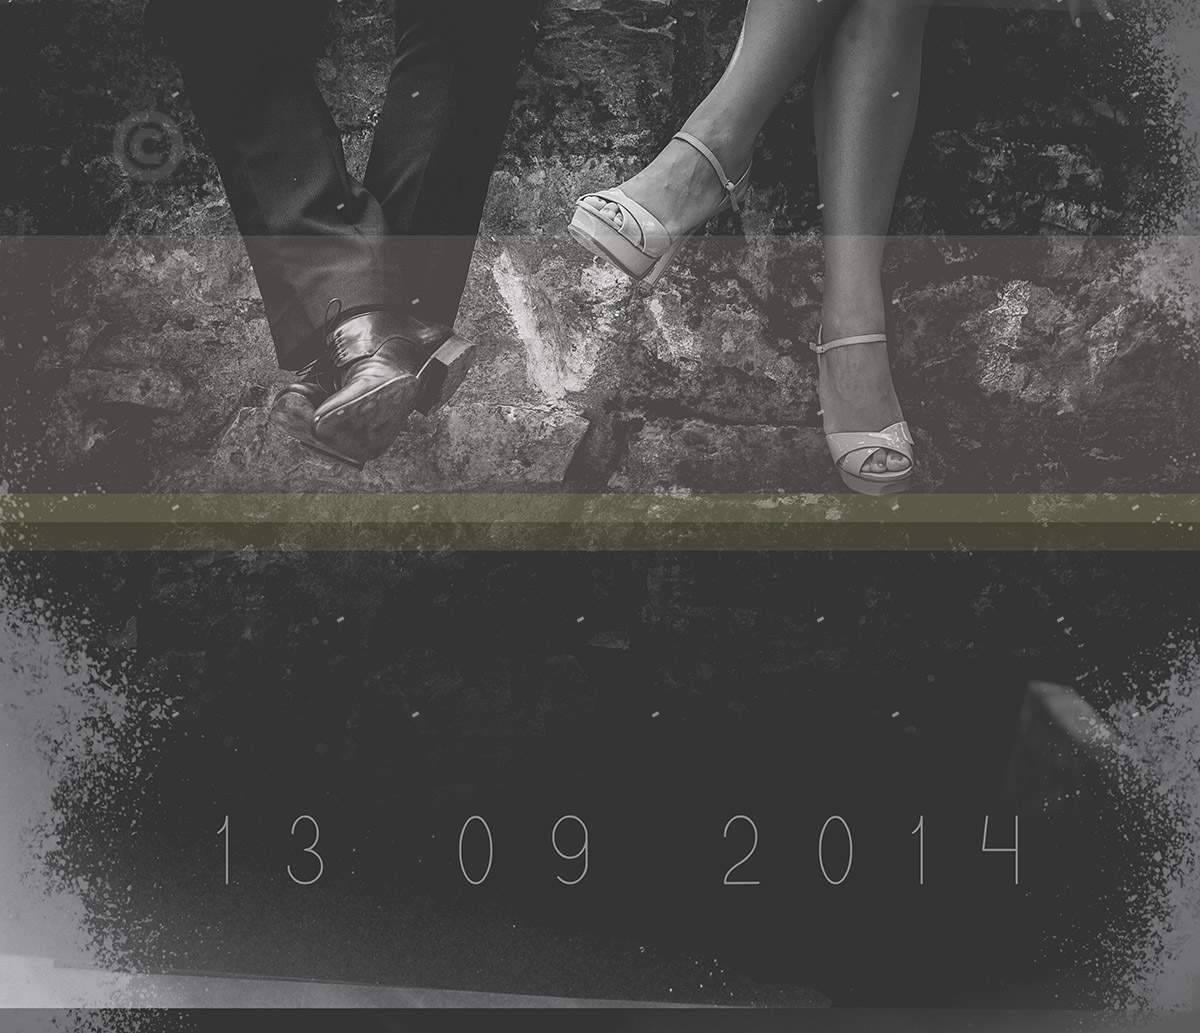 Pelion, the photo album | ψηφιακά άλμπουμ γάμου και βάπτισης | wedding photo albums